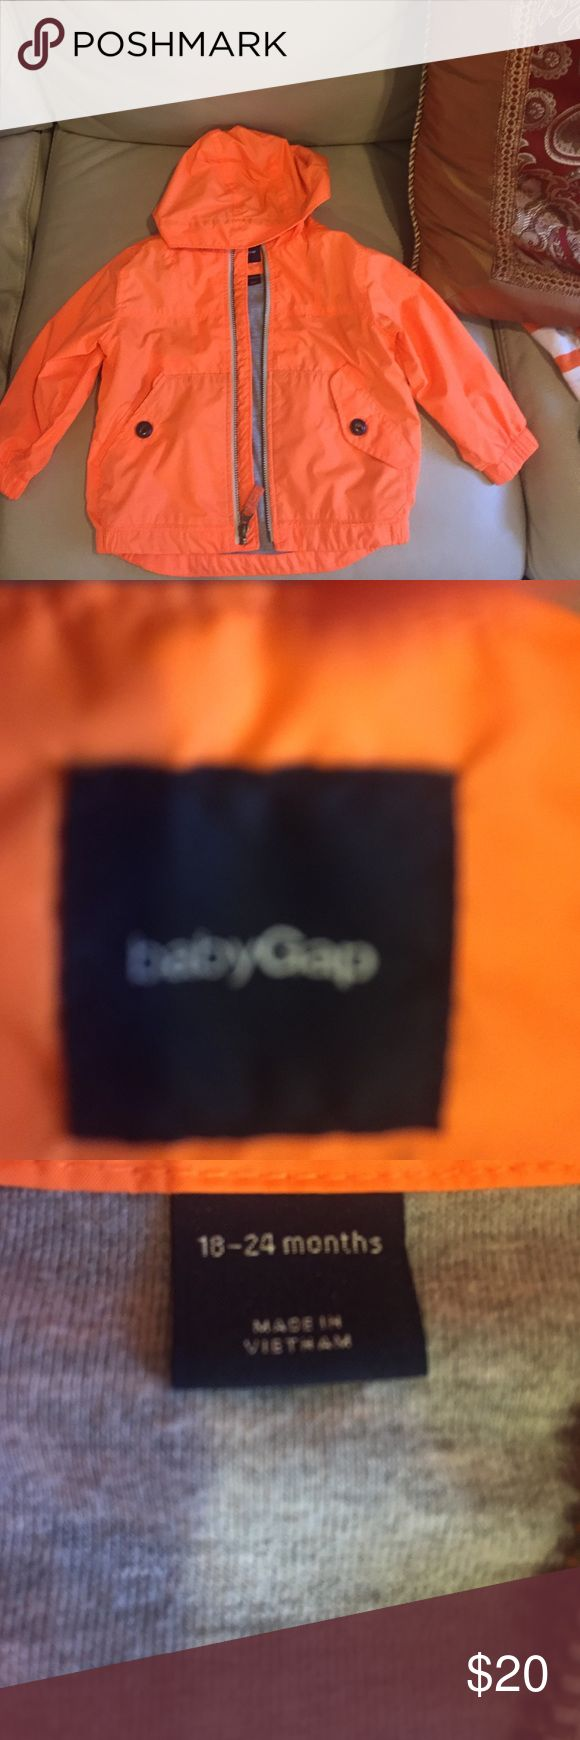 Gap jacket 18-24 mos gently used Gap Jackets & Coats